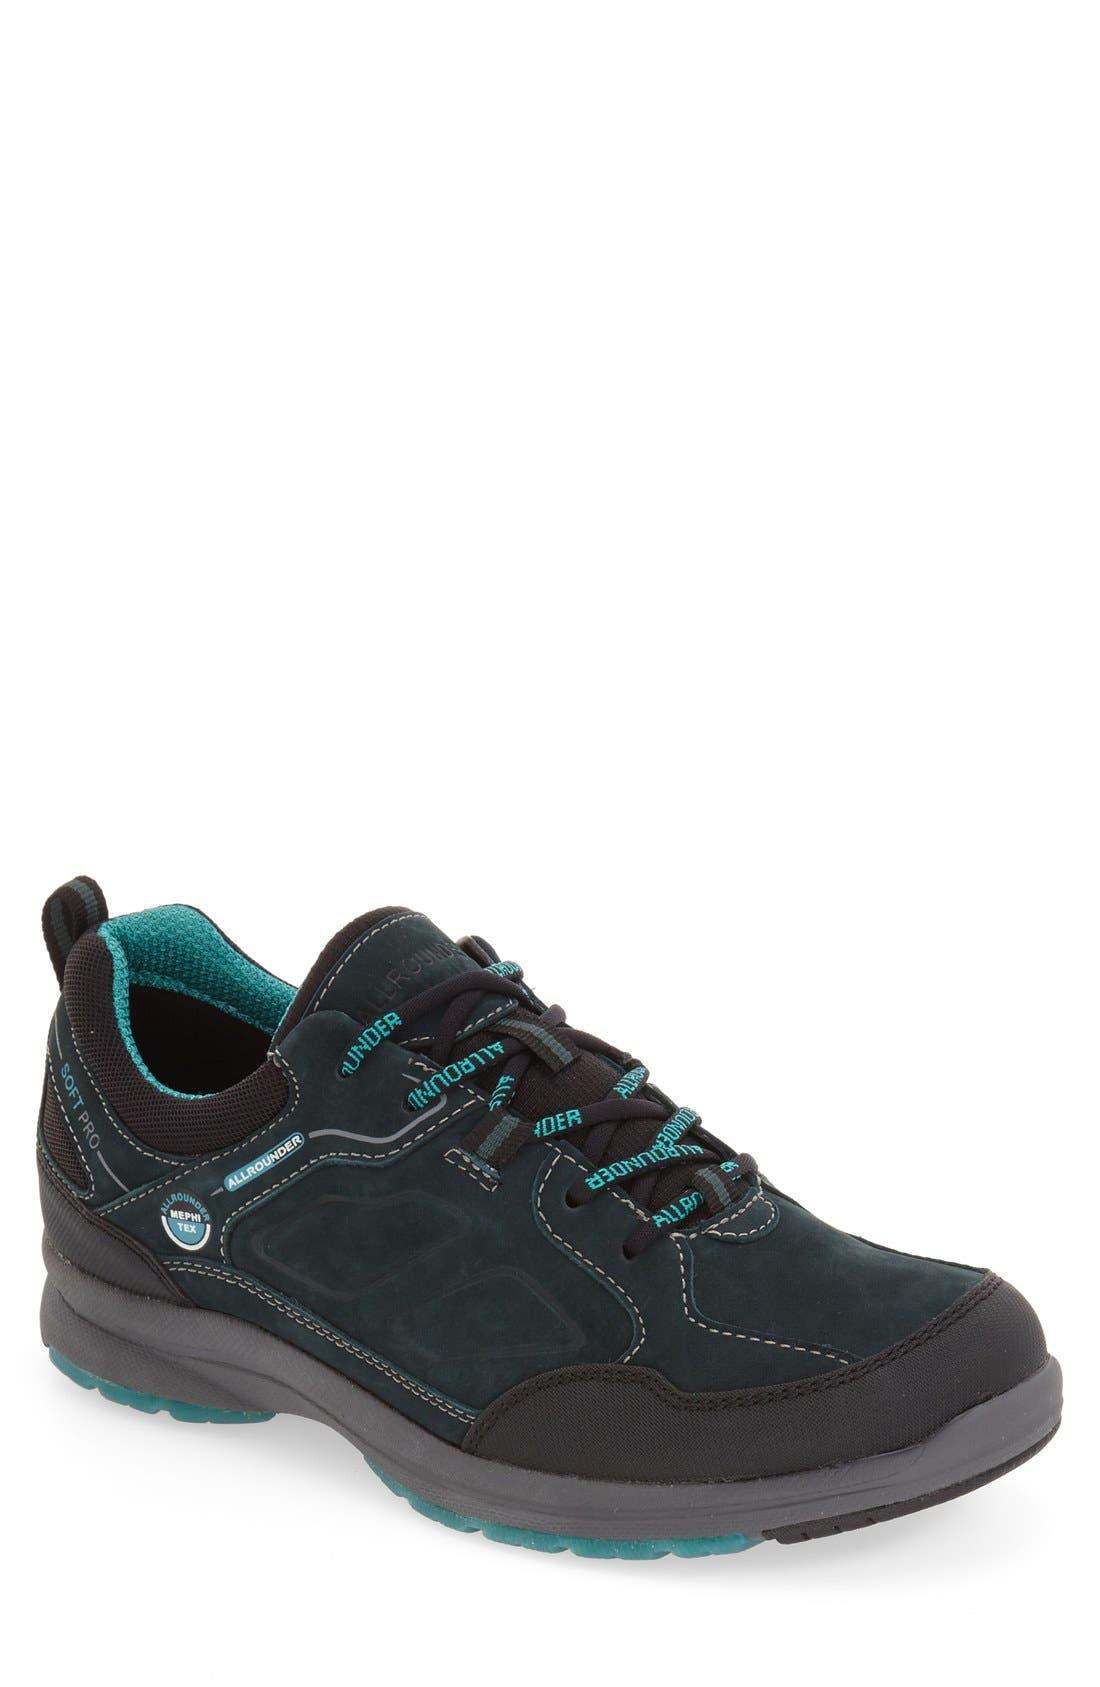 Alternate Image 1 Selected - Allrounder by Mephisto 'Dascha Tex' Waterproof Sneaker (Women)